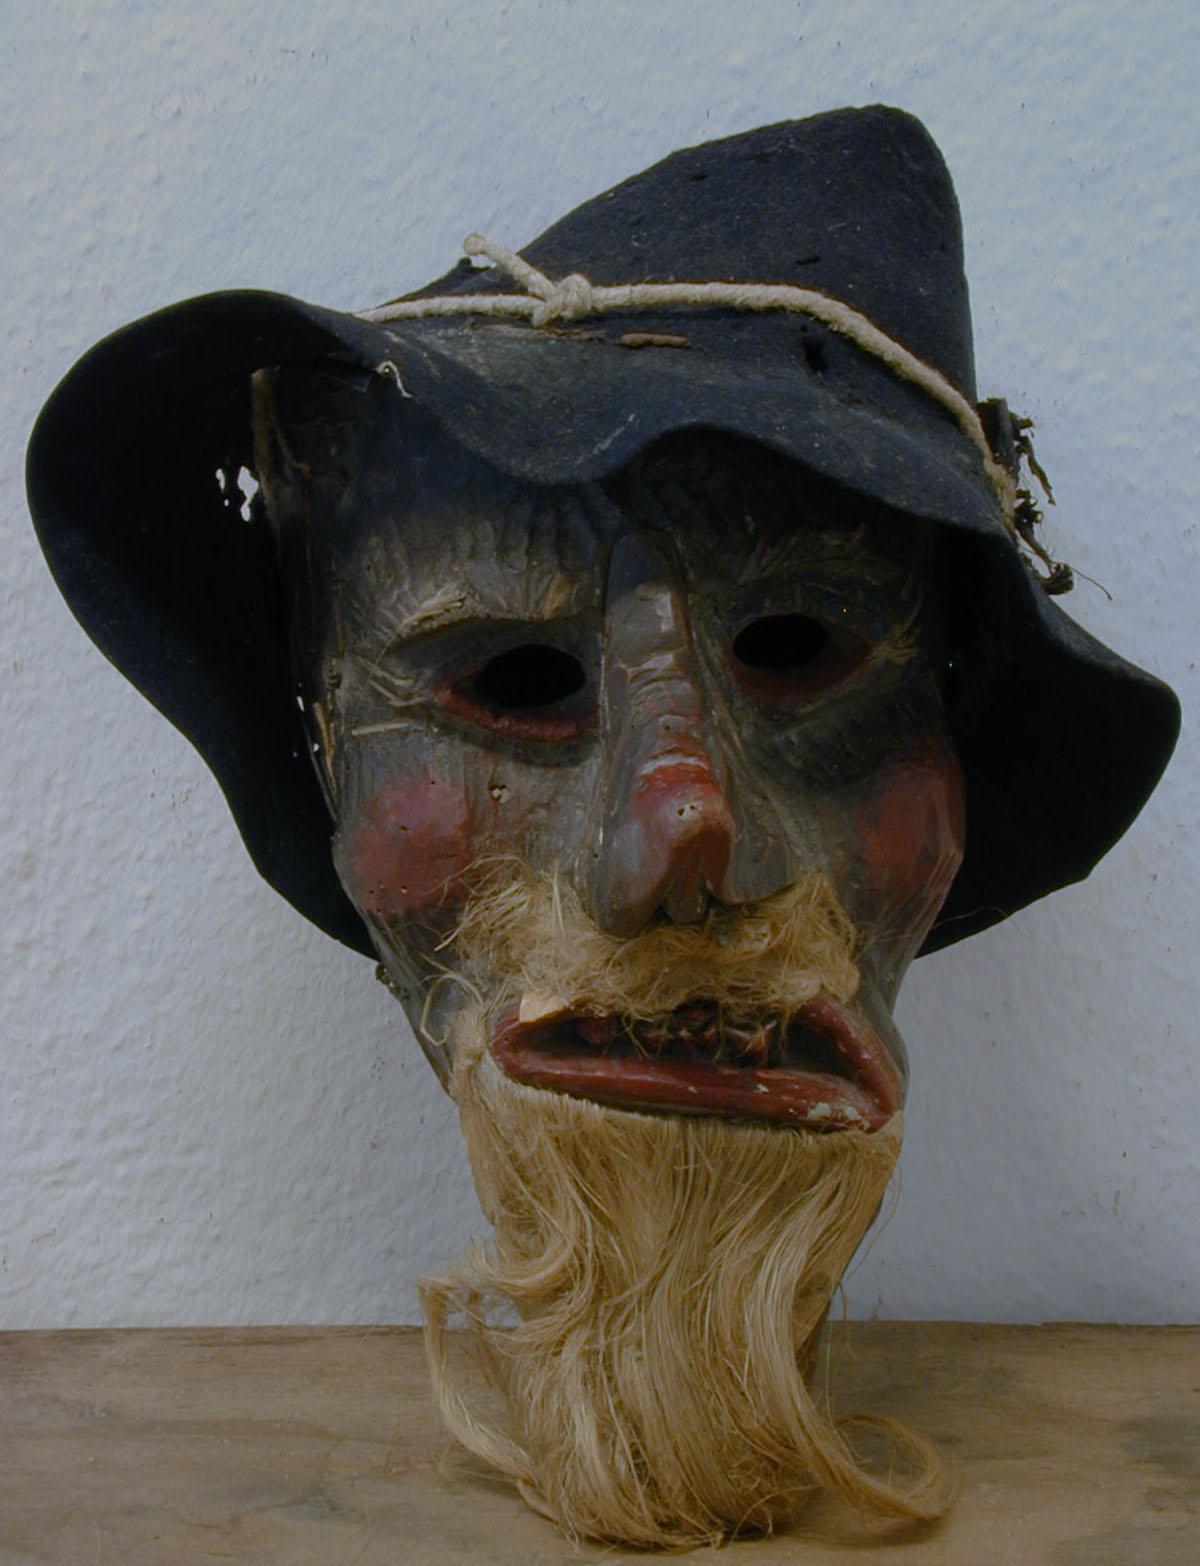 Carnival Mask - Tarcento